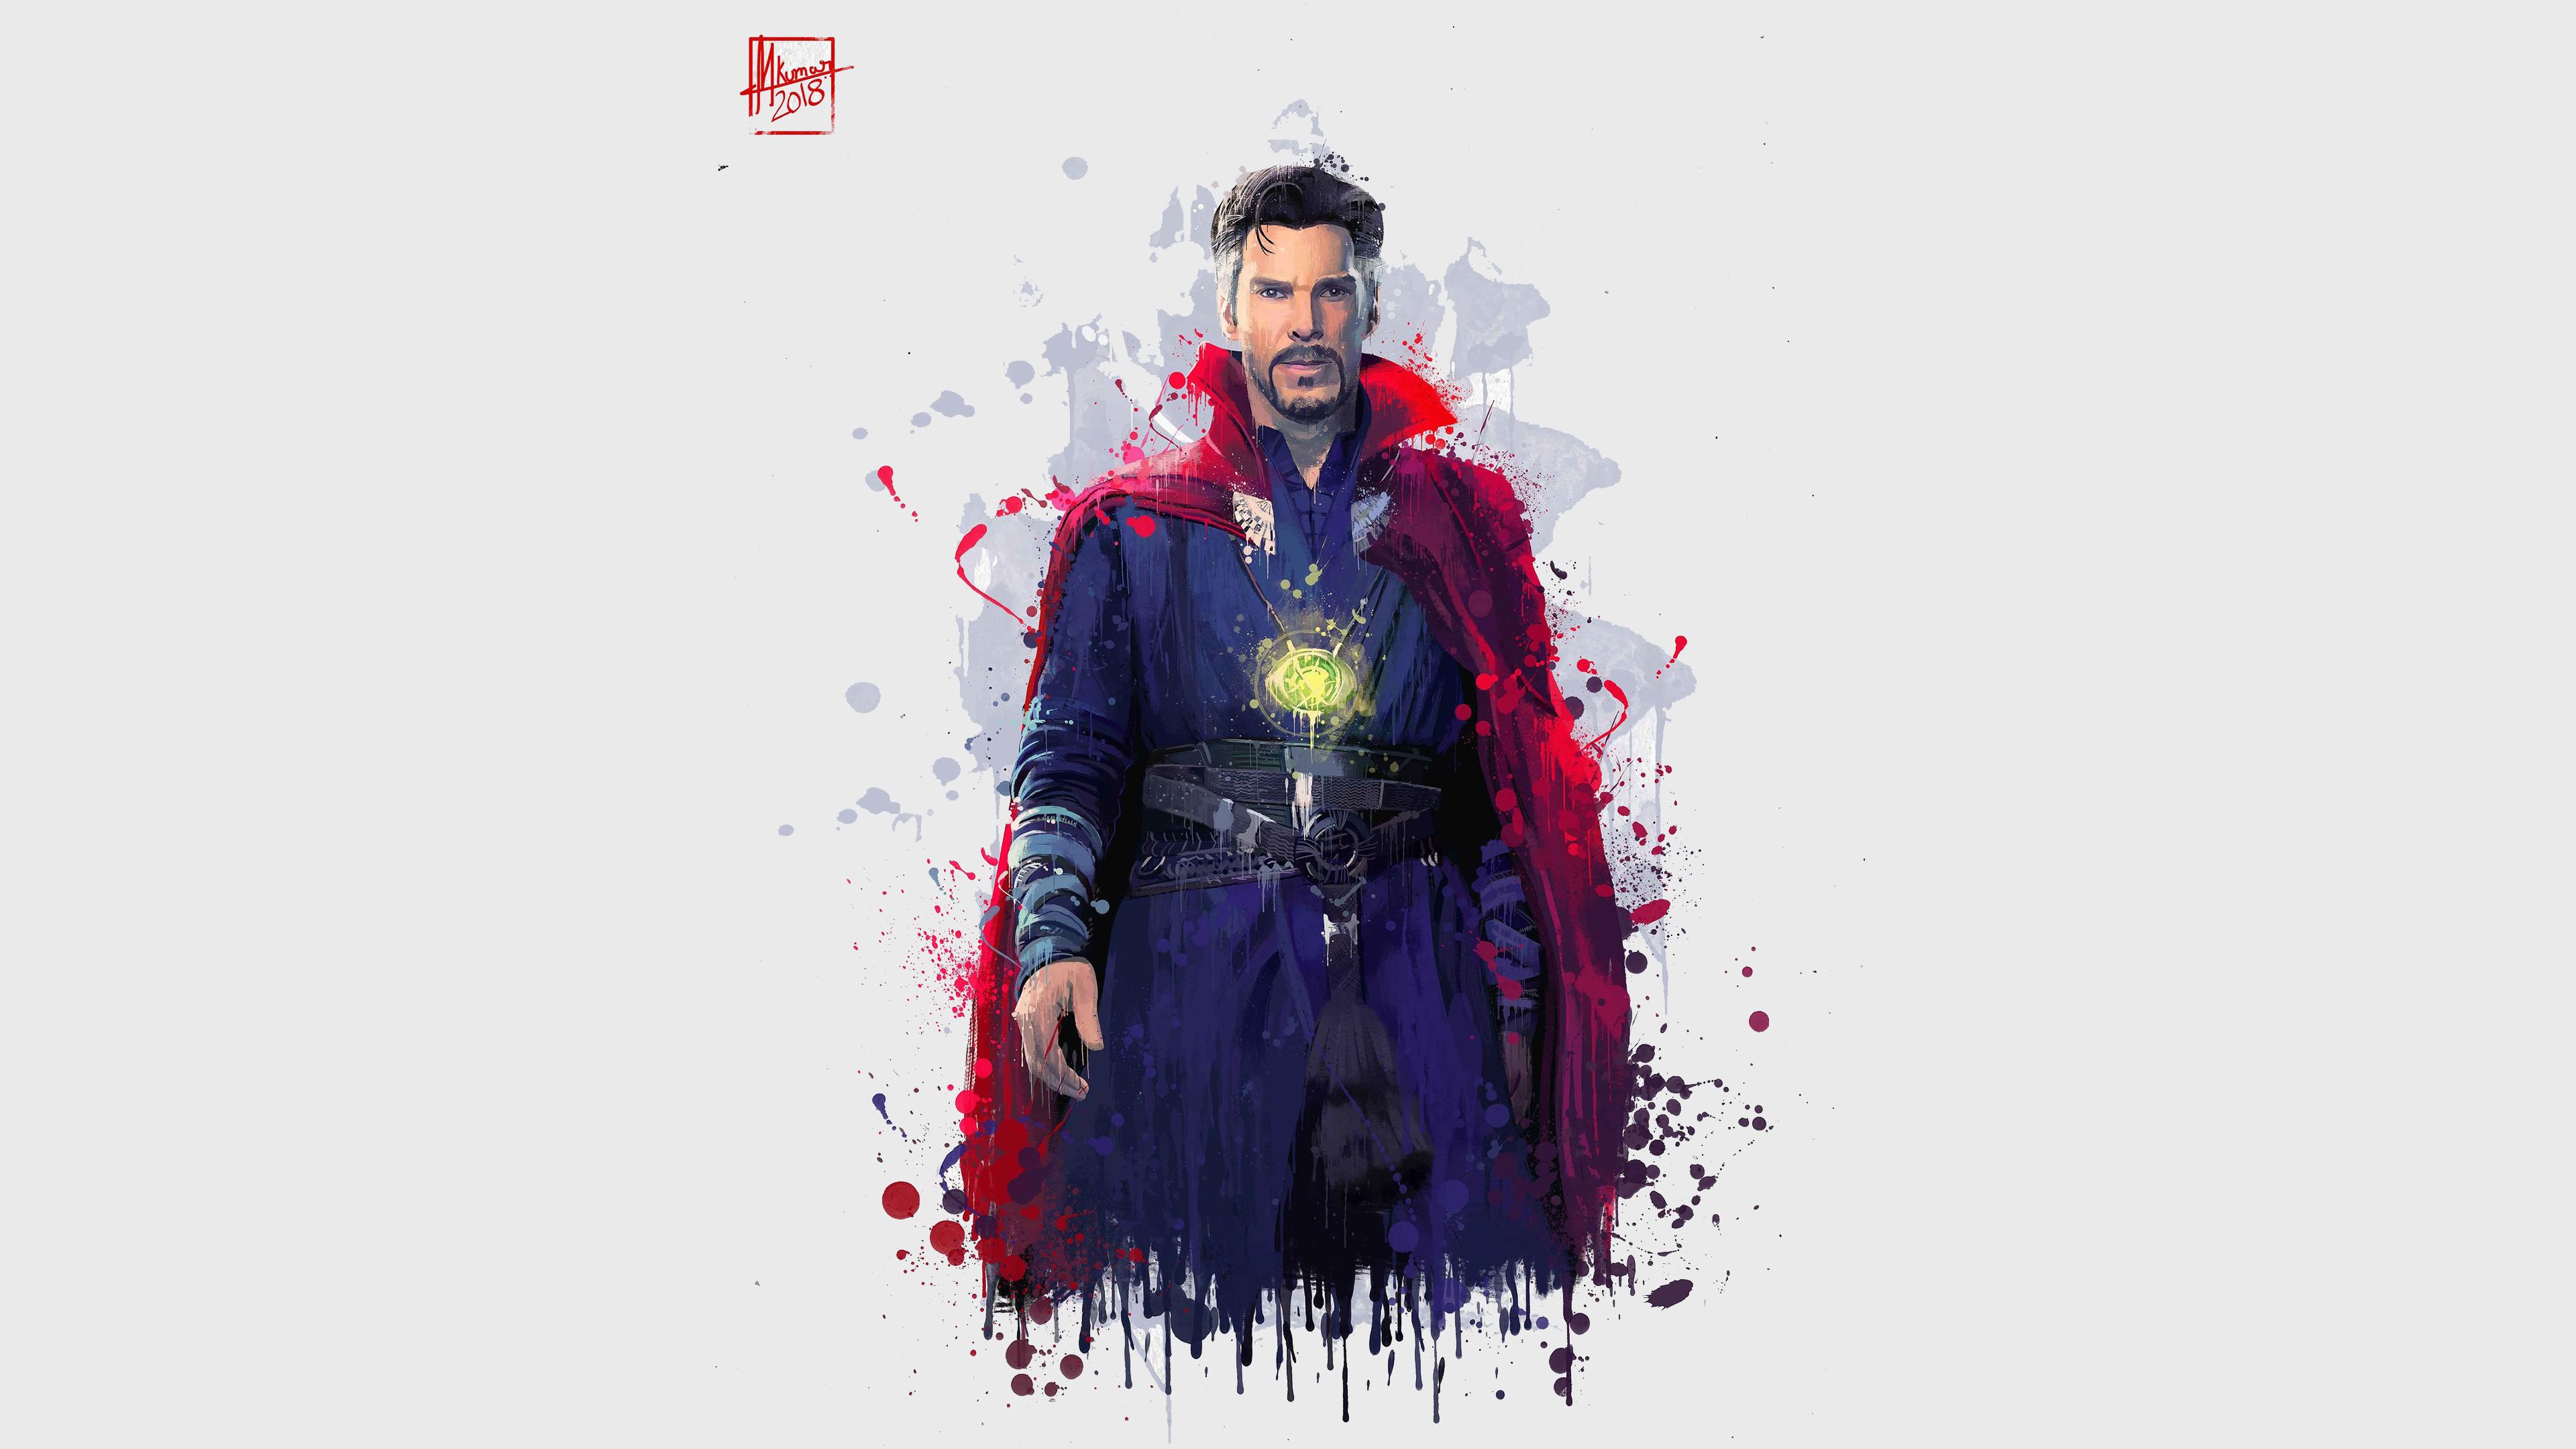 Download 3840x2400 Wallpaper Doctor Strange Avengers Infinity War Artwork 4k Ultra Hd 16 10 Widescreen 3840x2400 Hd Image Background 5382